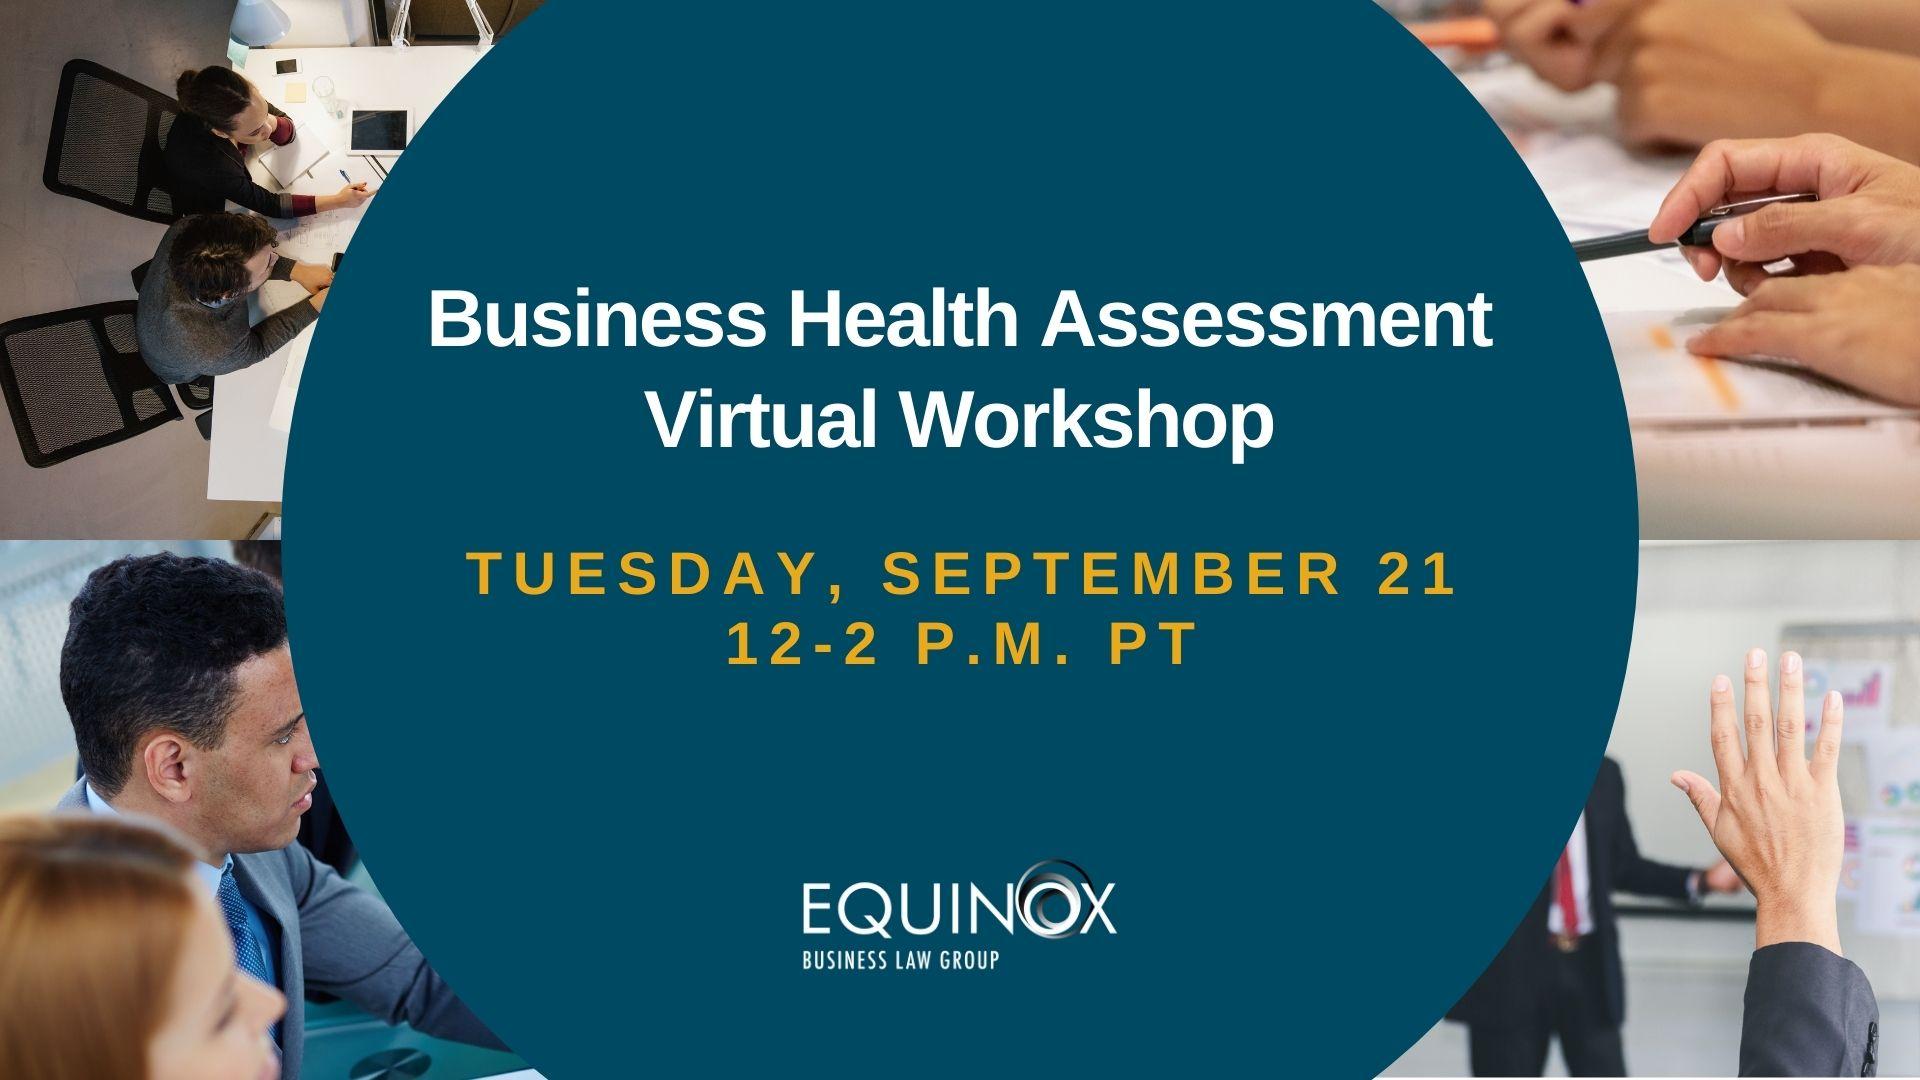 Business health assessment